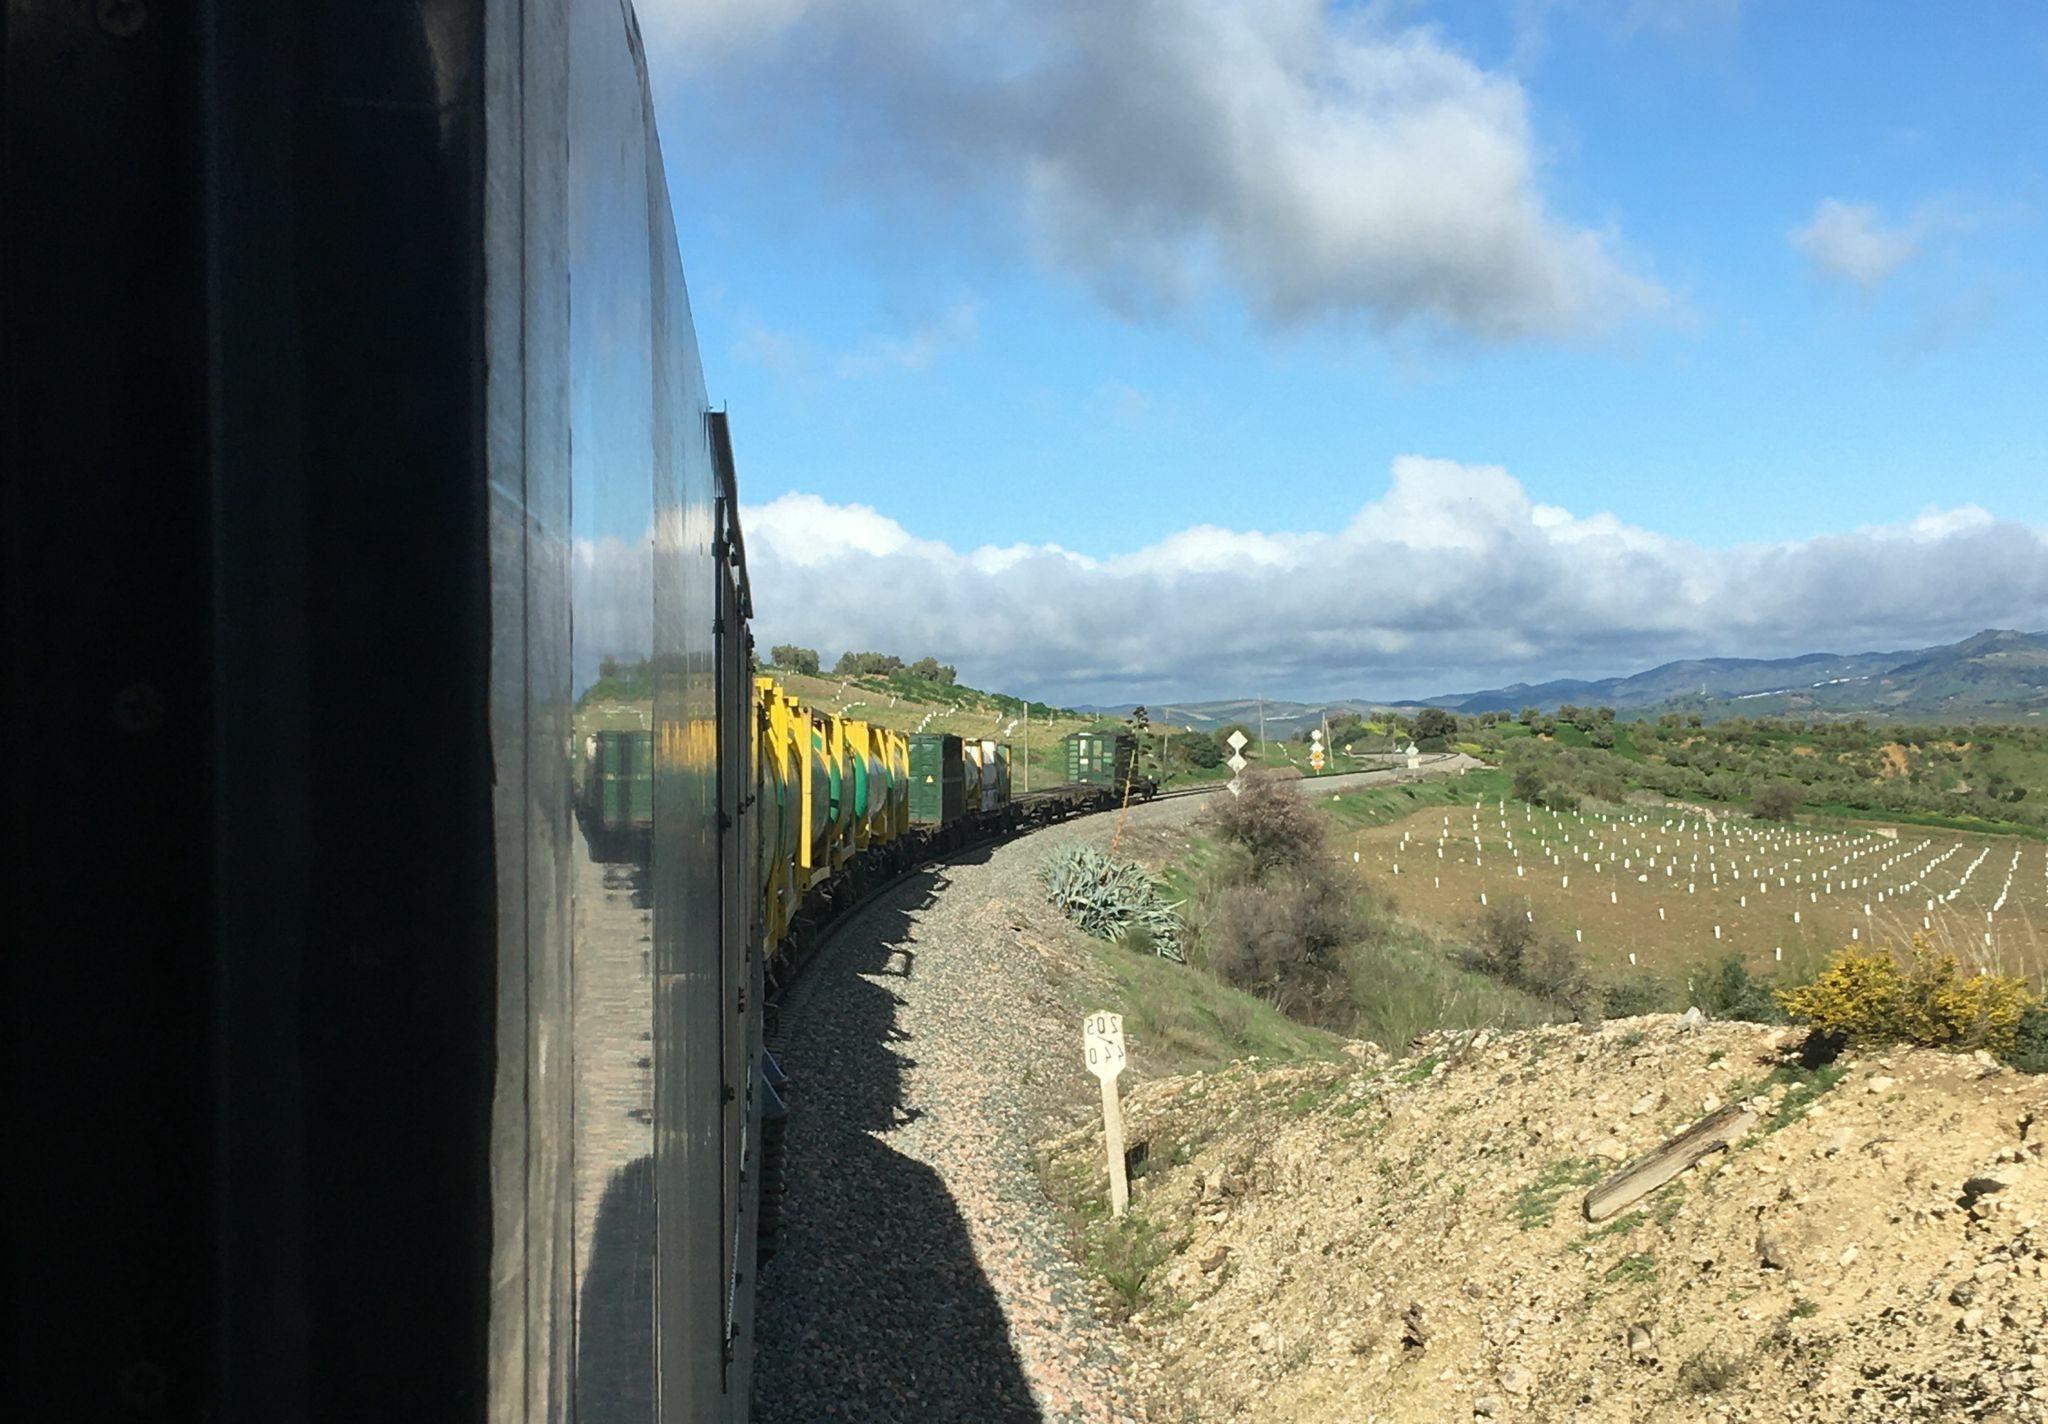 Tren Multirail de Almargen a Setenil